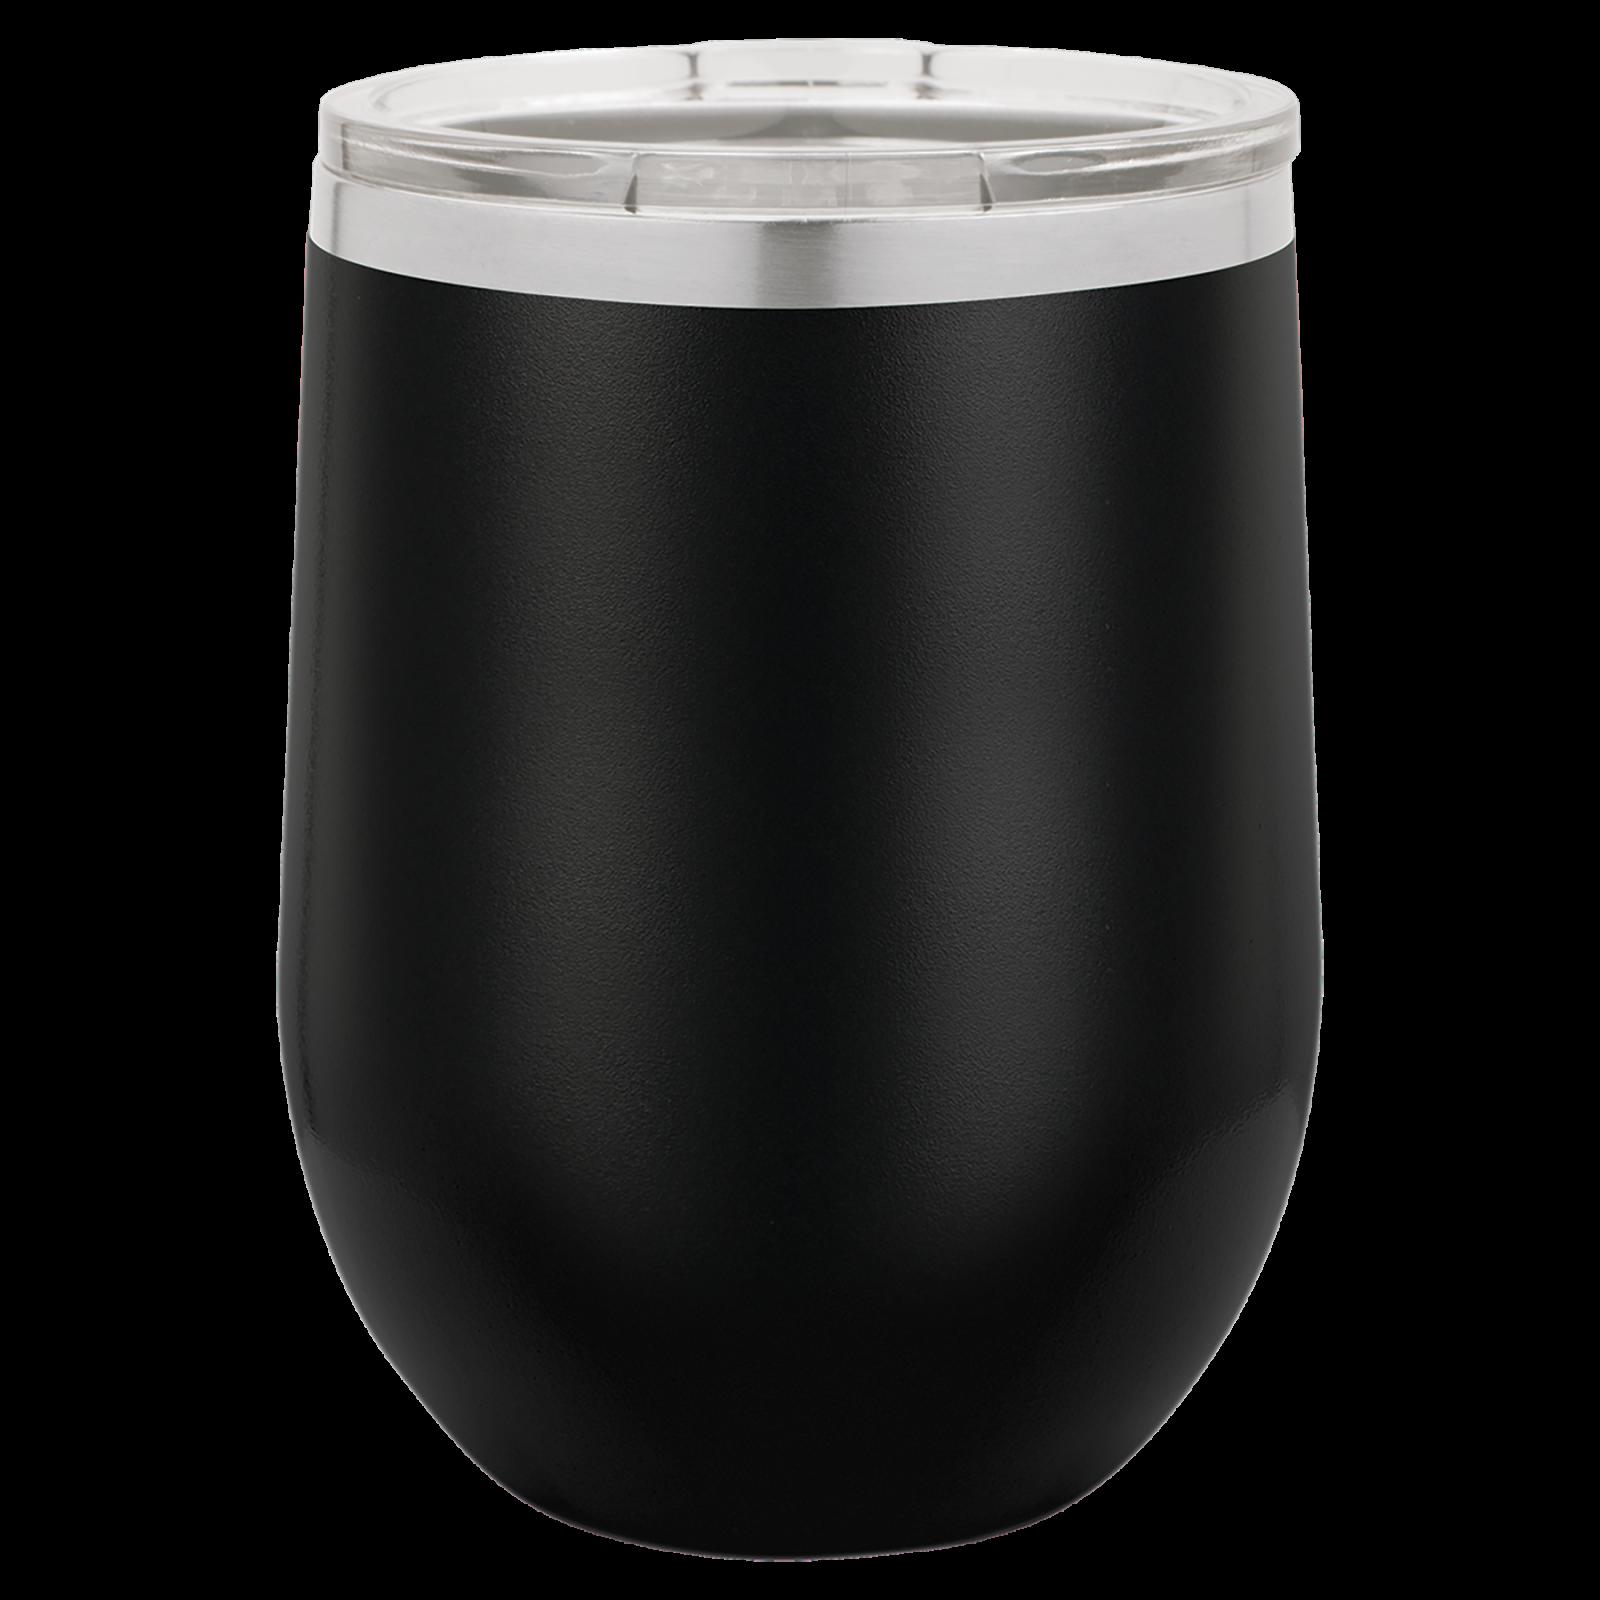 12 oz Stemless wine cup BLACK